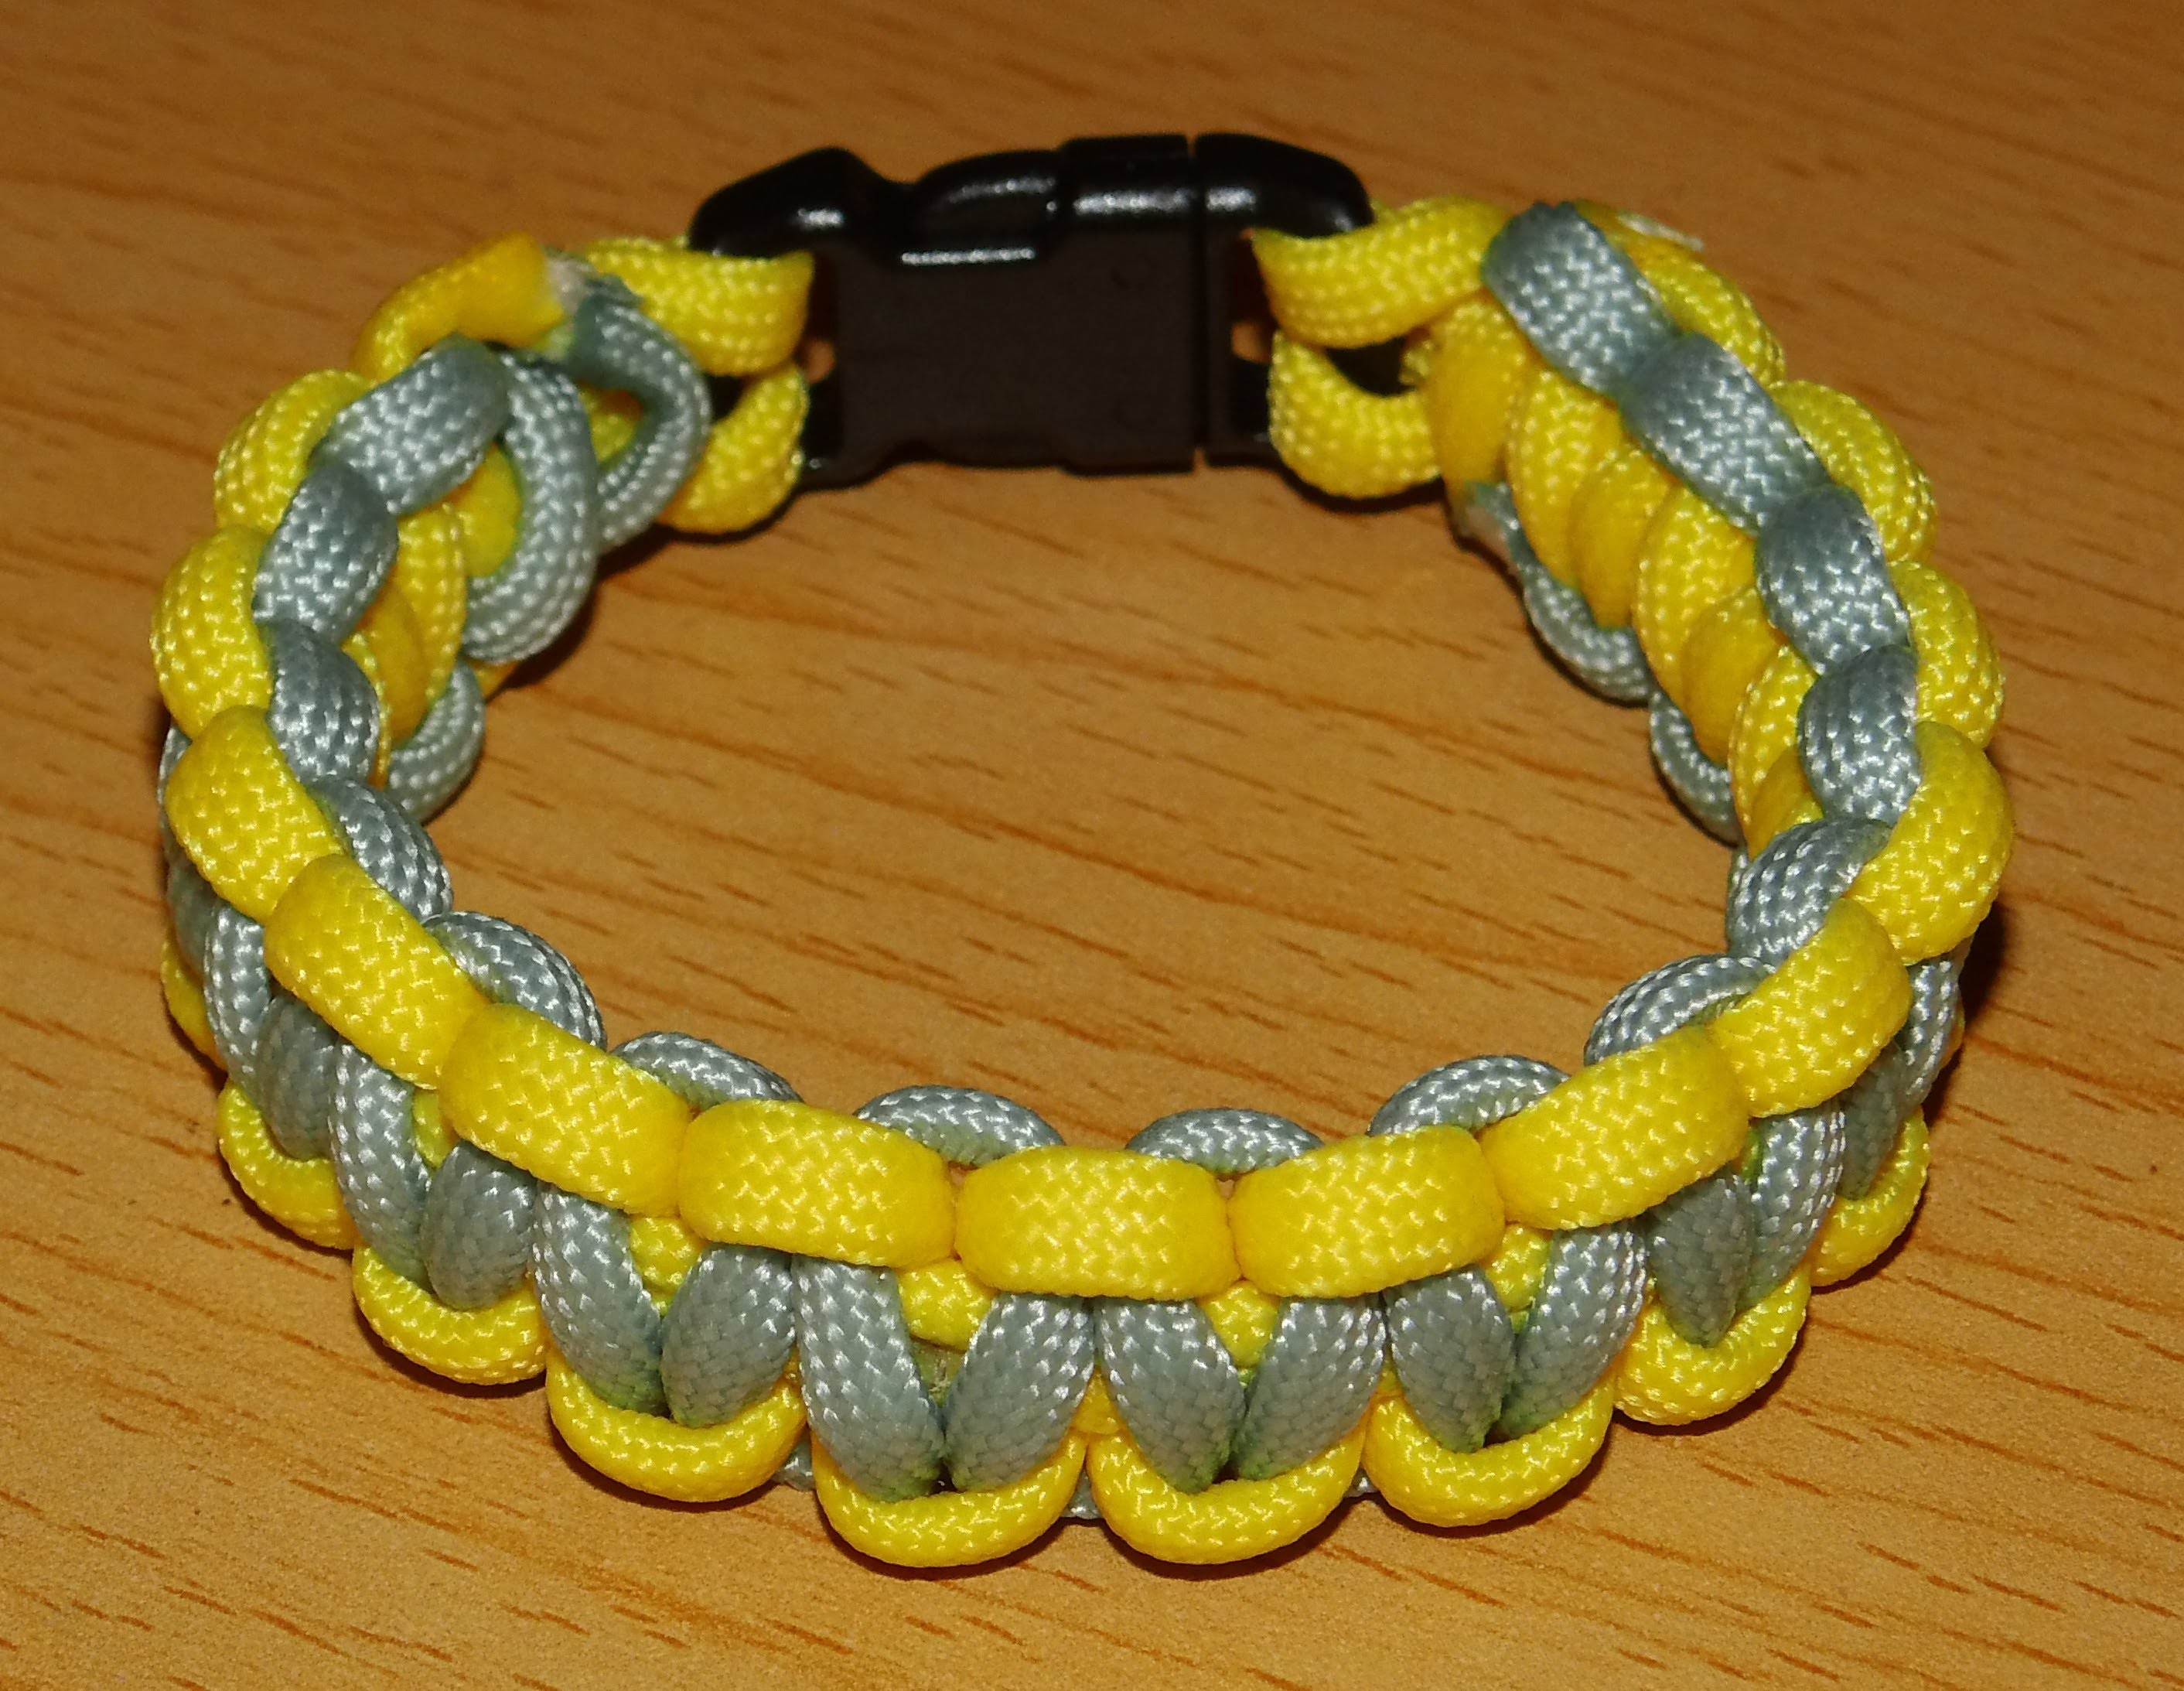 Anleitung zweifarbiges Paracord Armband *D*